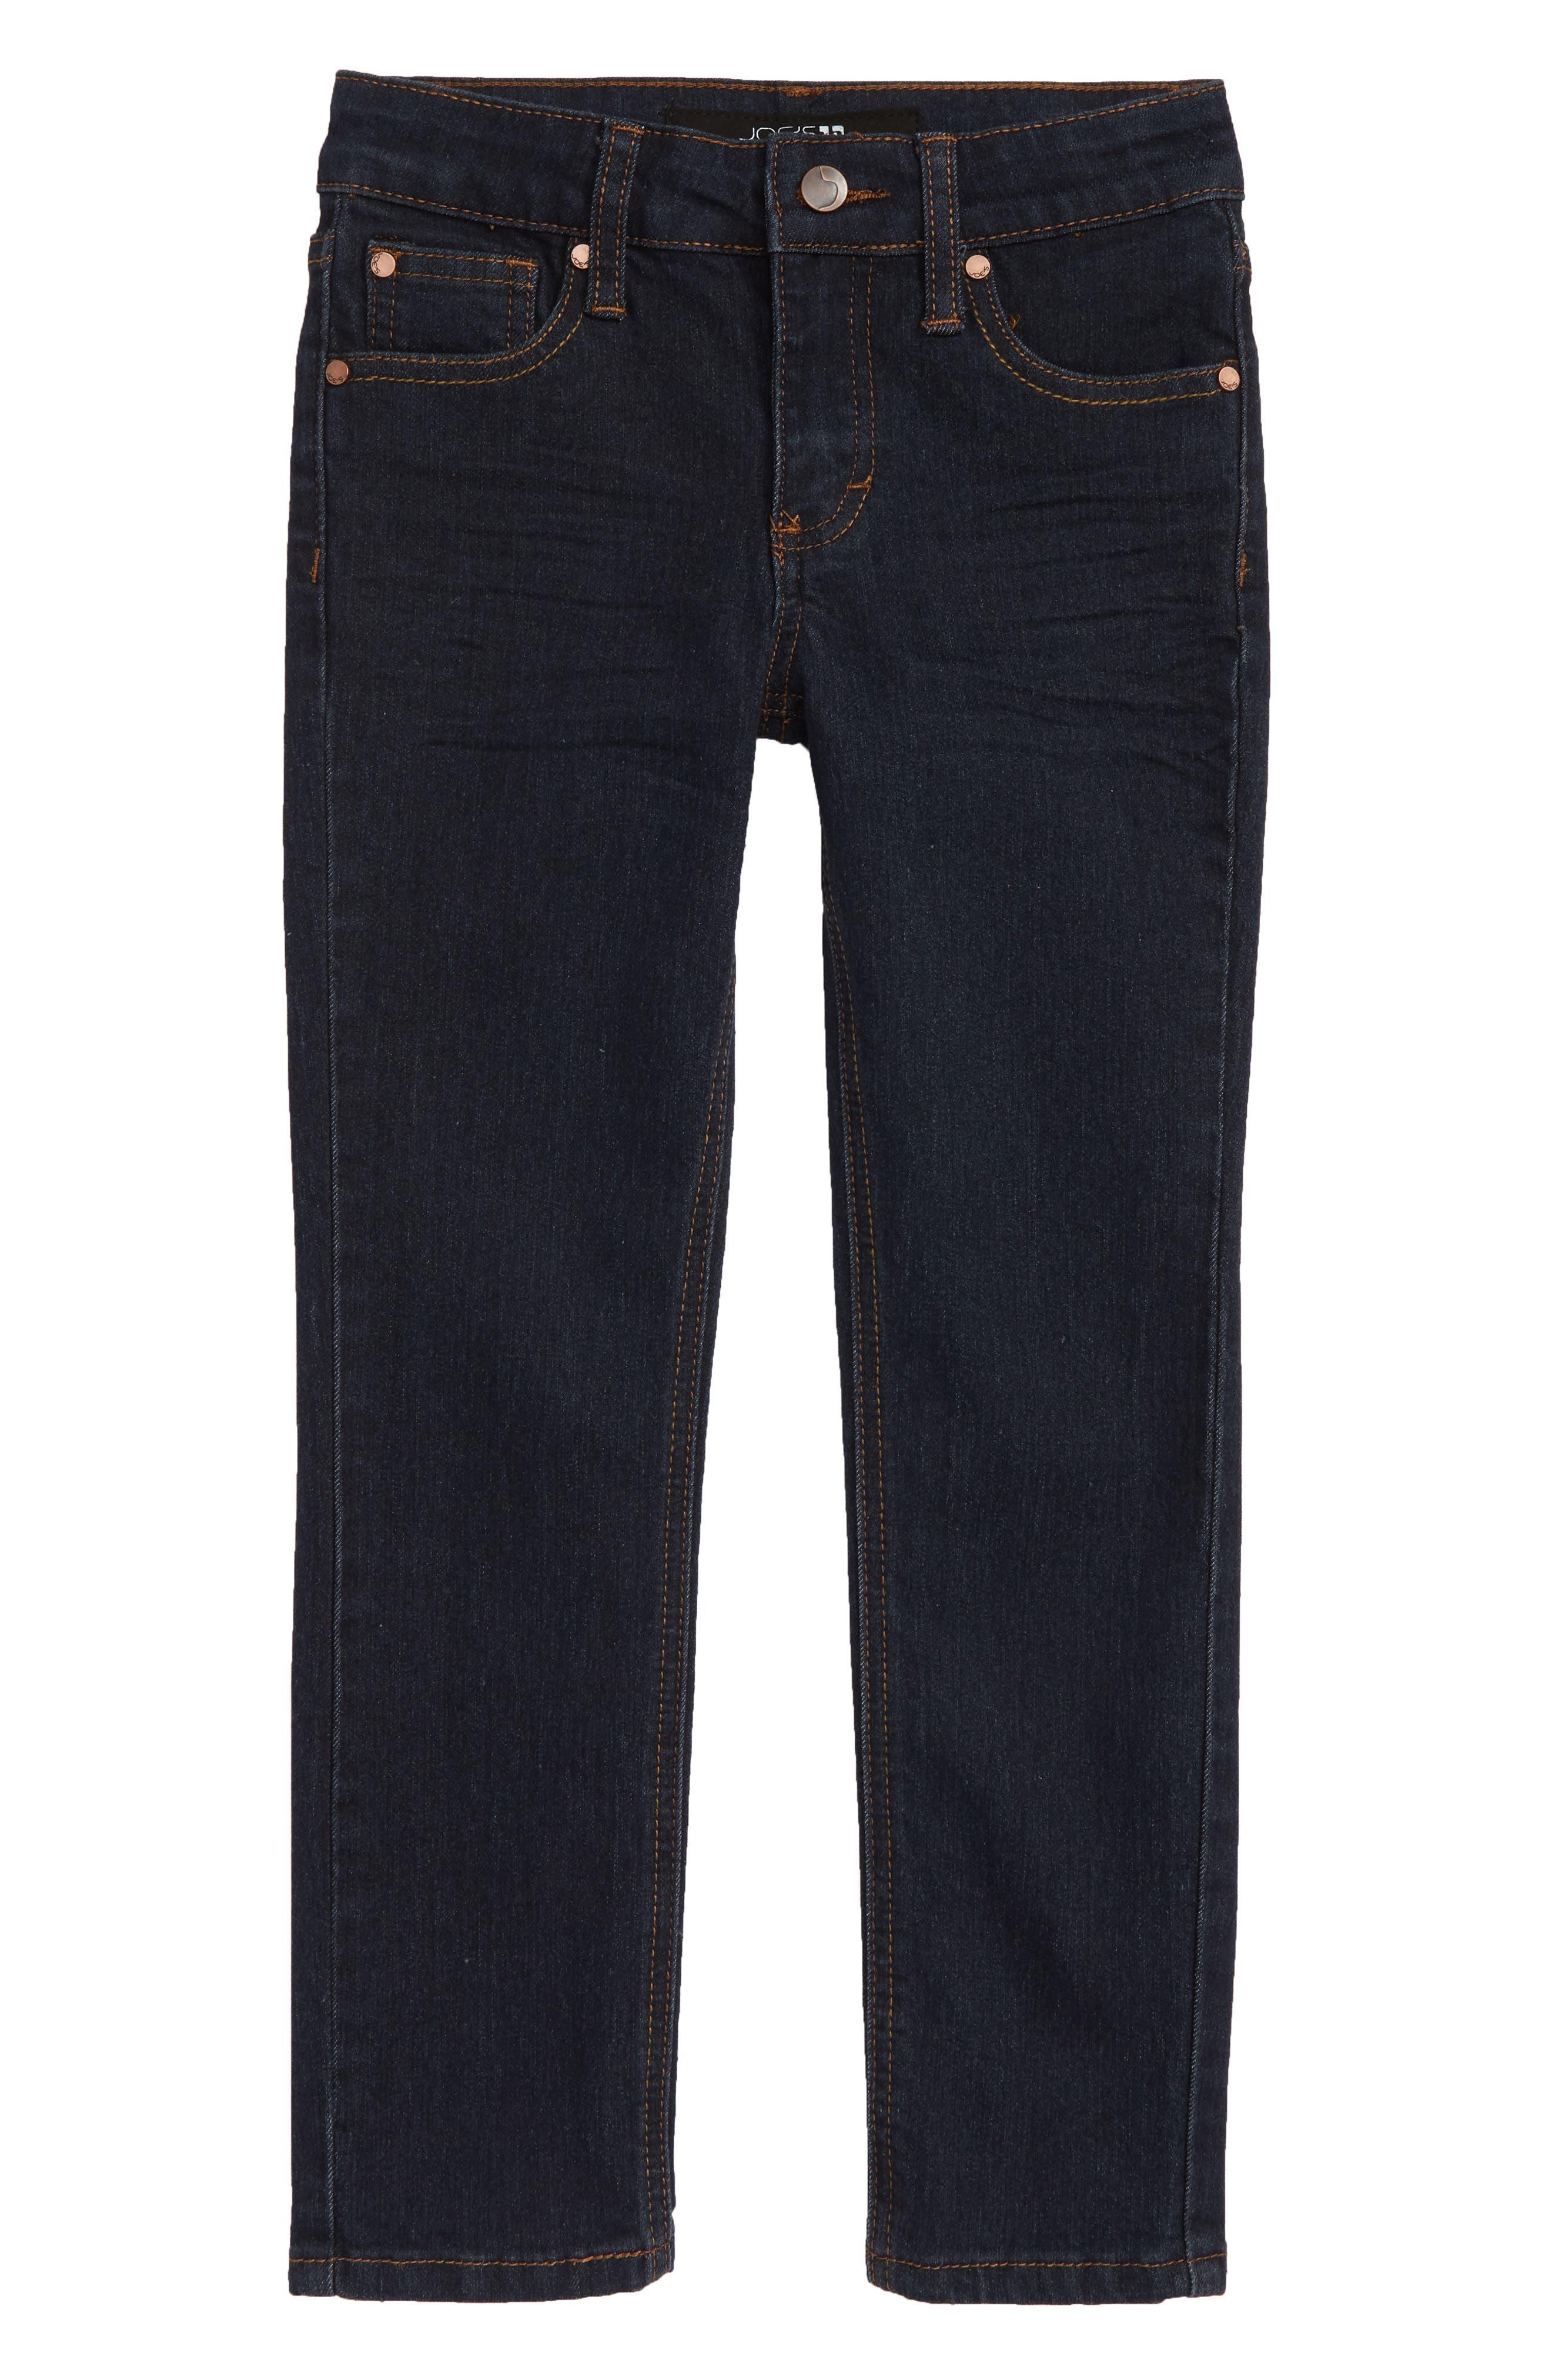 Brixton Stretch Jeans,                             Main thumbnail 1, color,                             Rinse